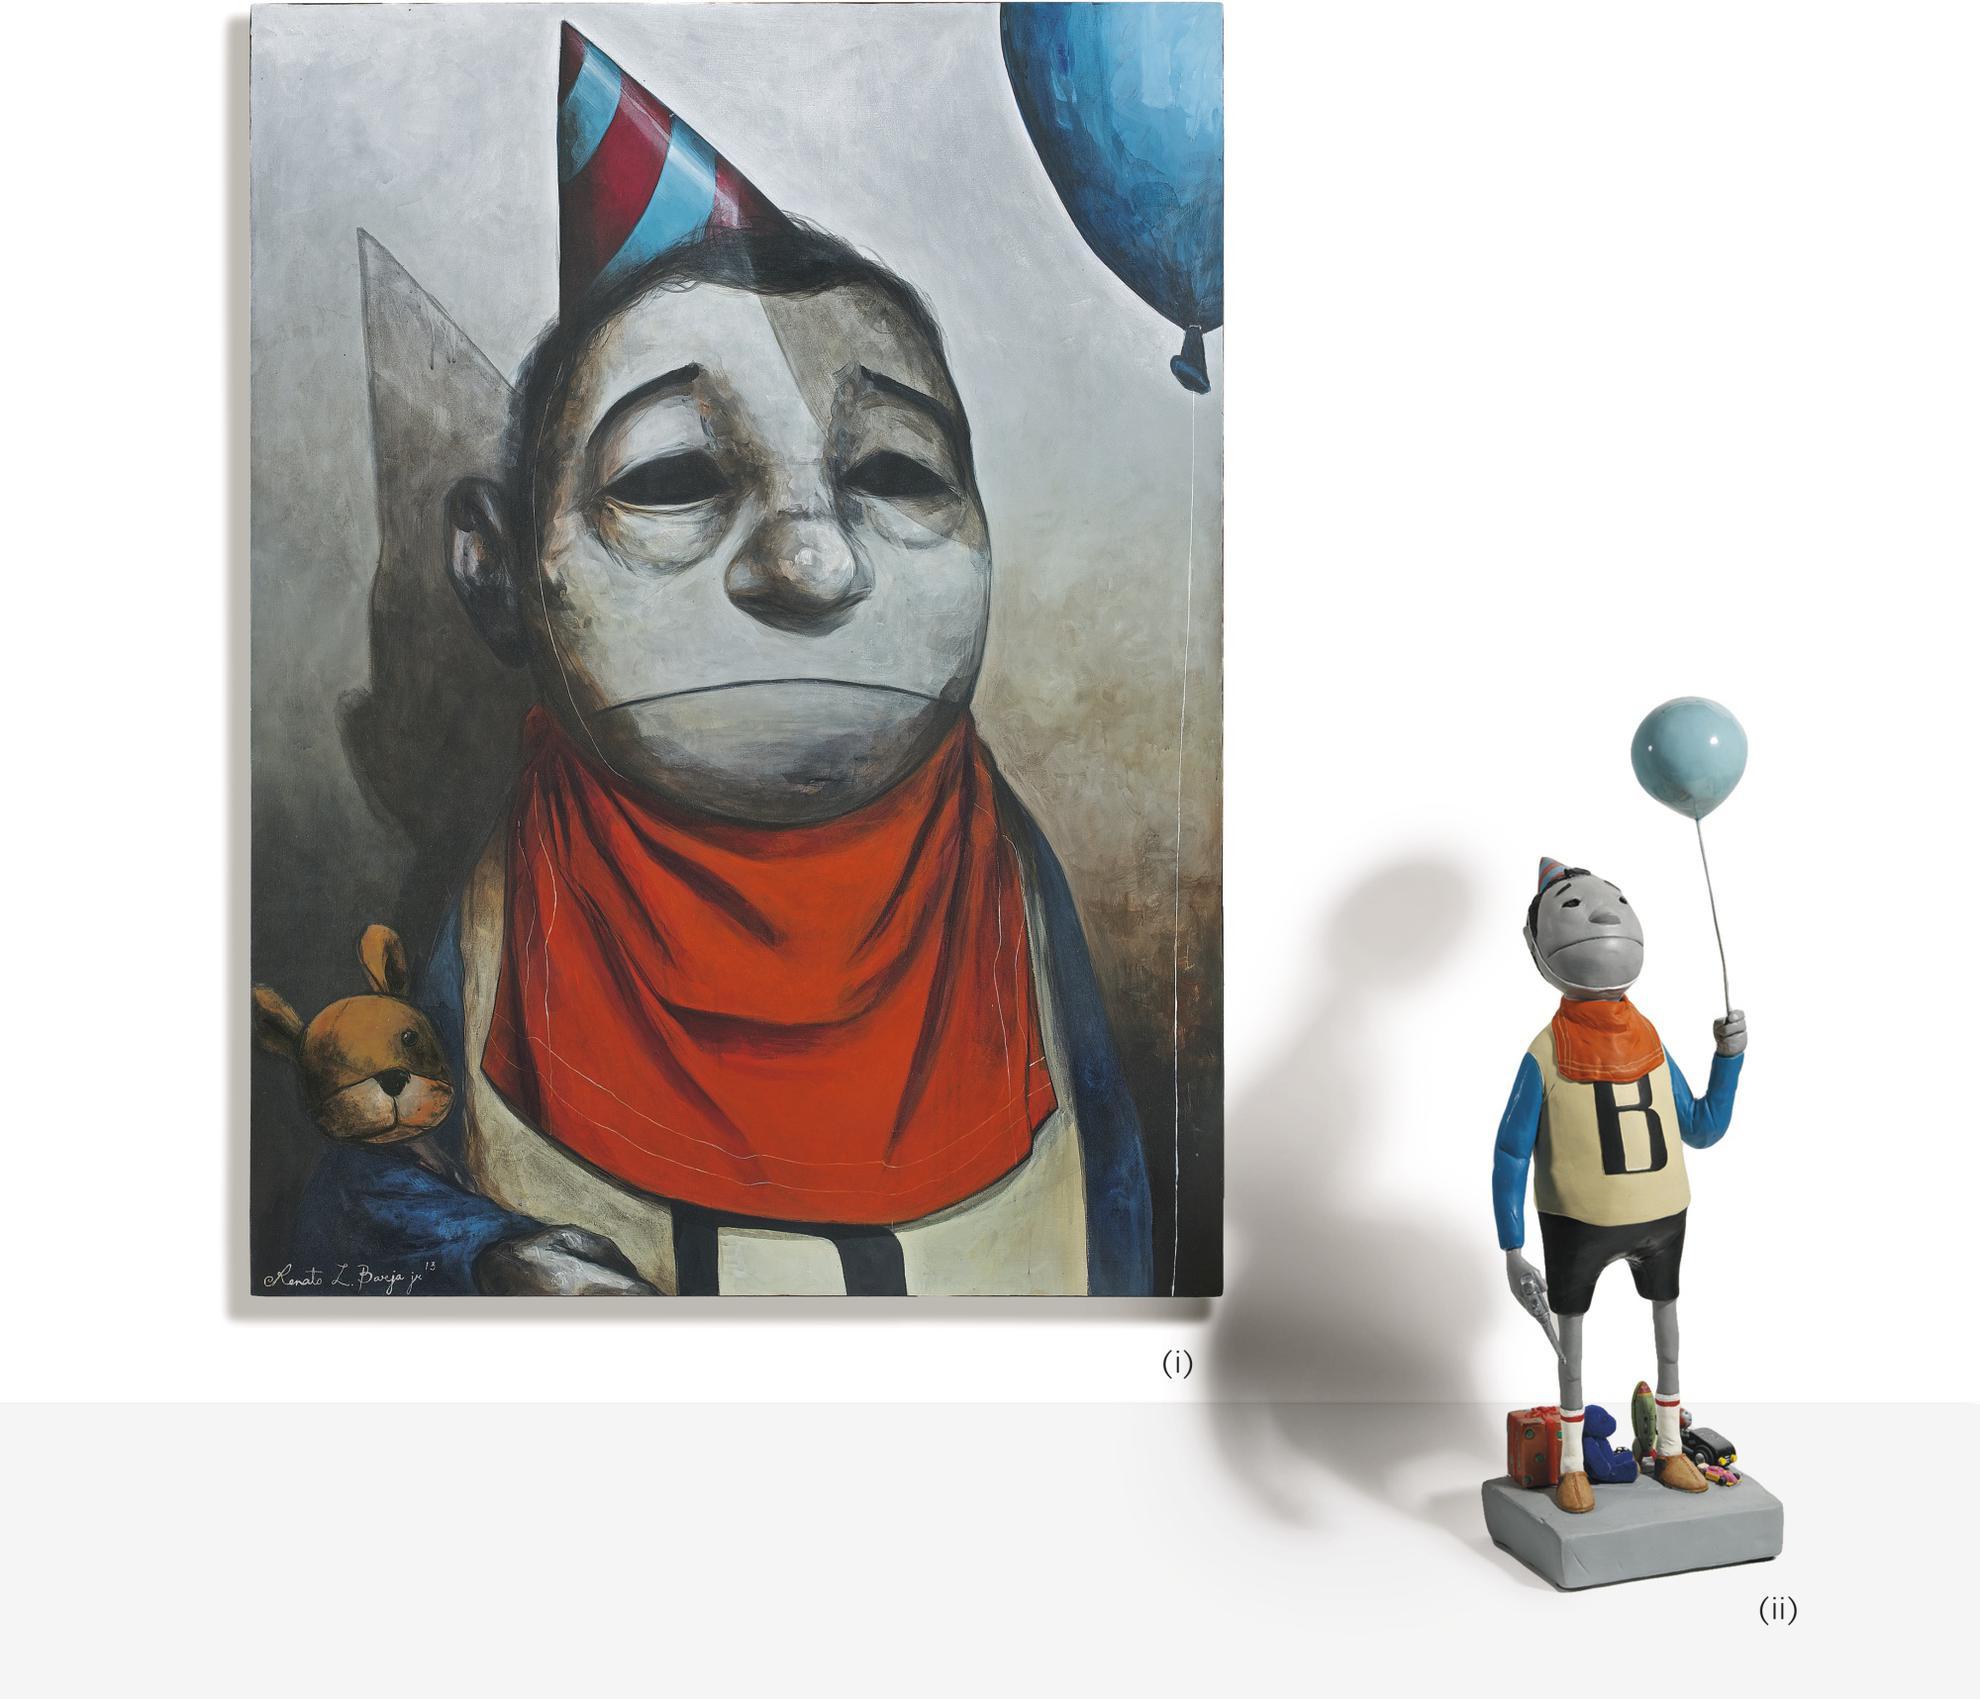 Renato Barja Jr - Birthday Boy (In Two Parts)-2013